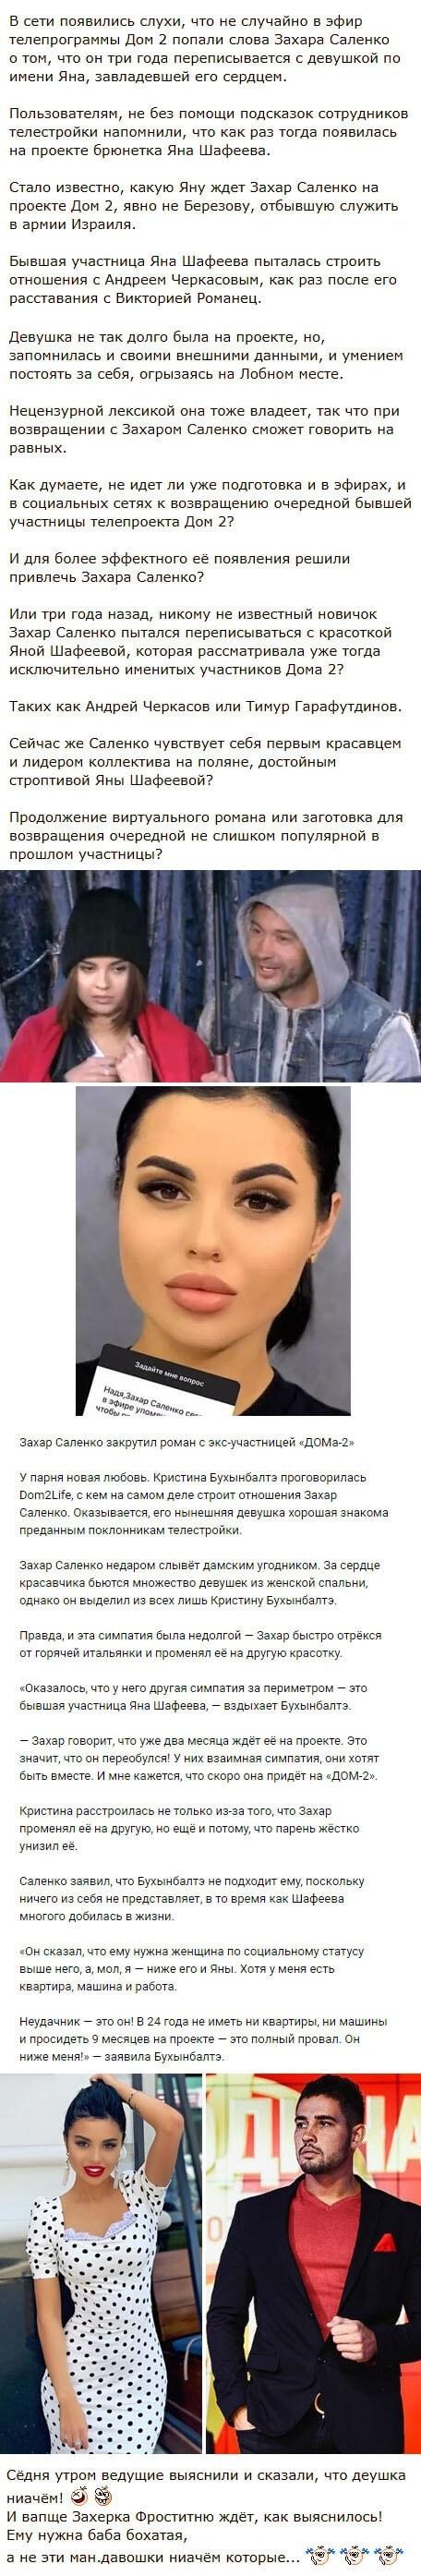 Ксения Бородина не одобрила новую девушку Захара Саленко